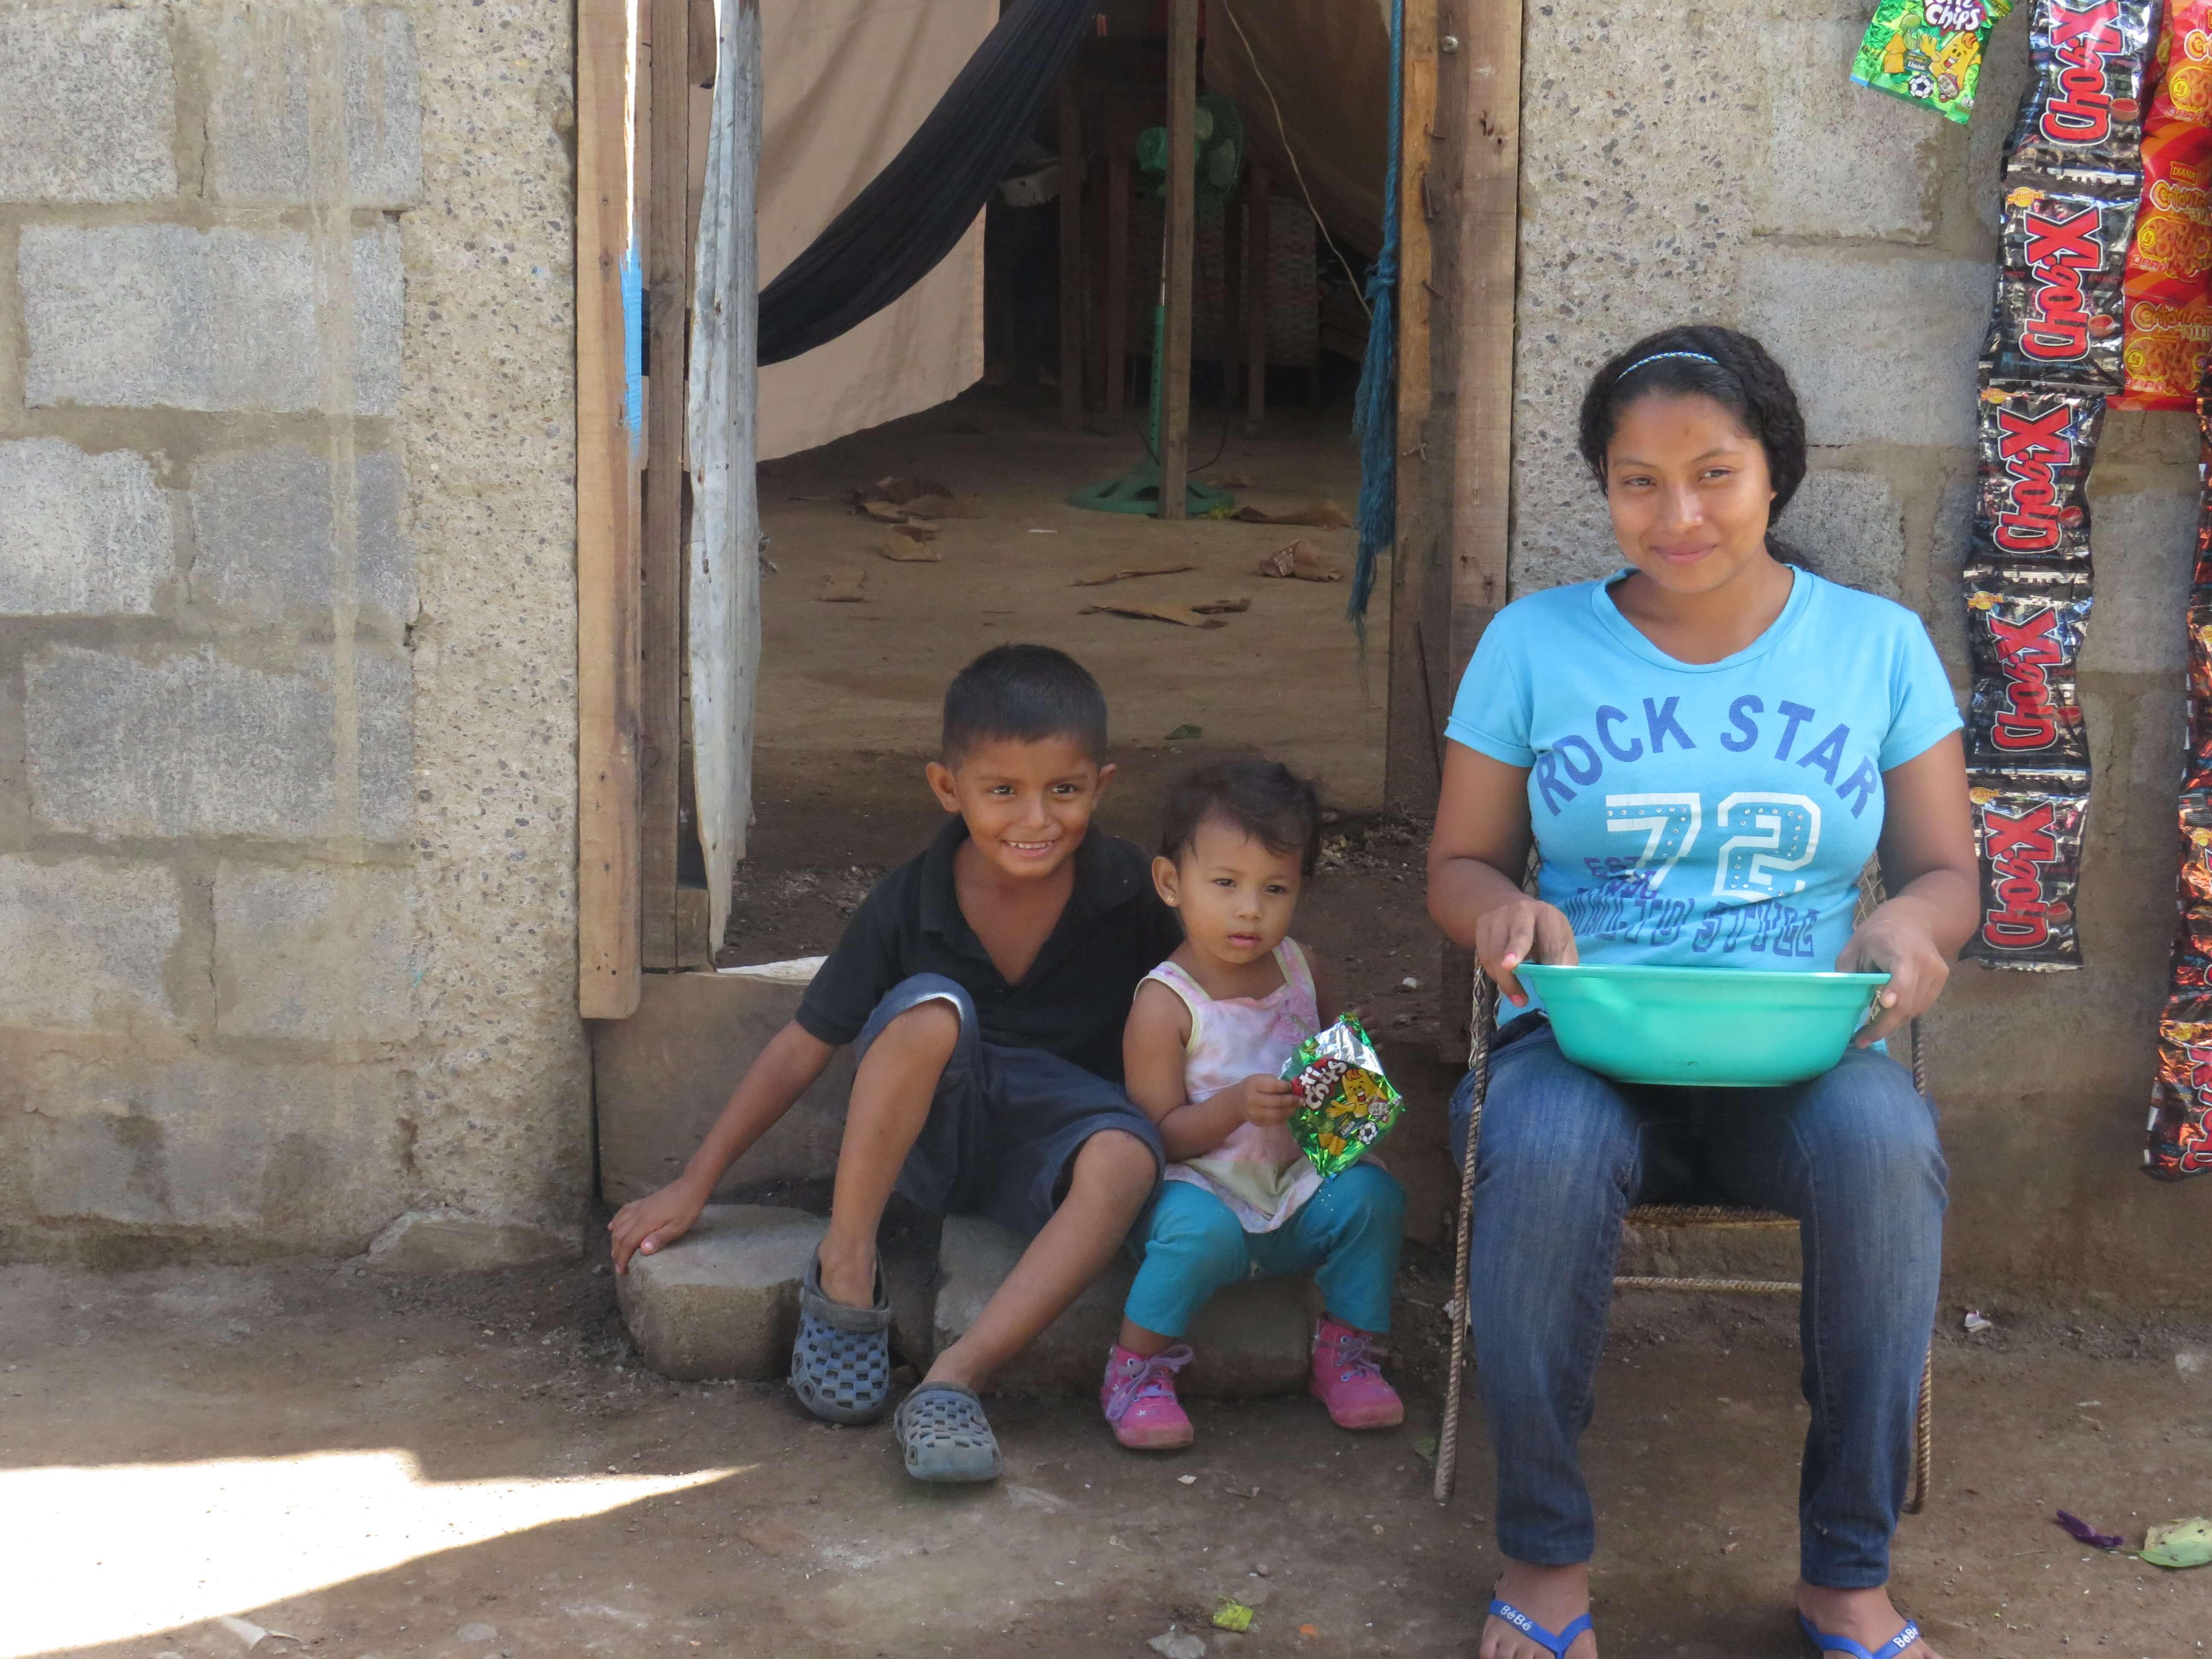 Menschen in Nicaragua / Nicaragua Backpacking Route